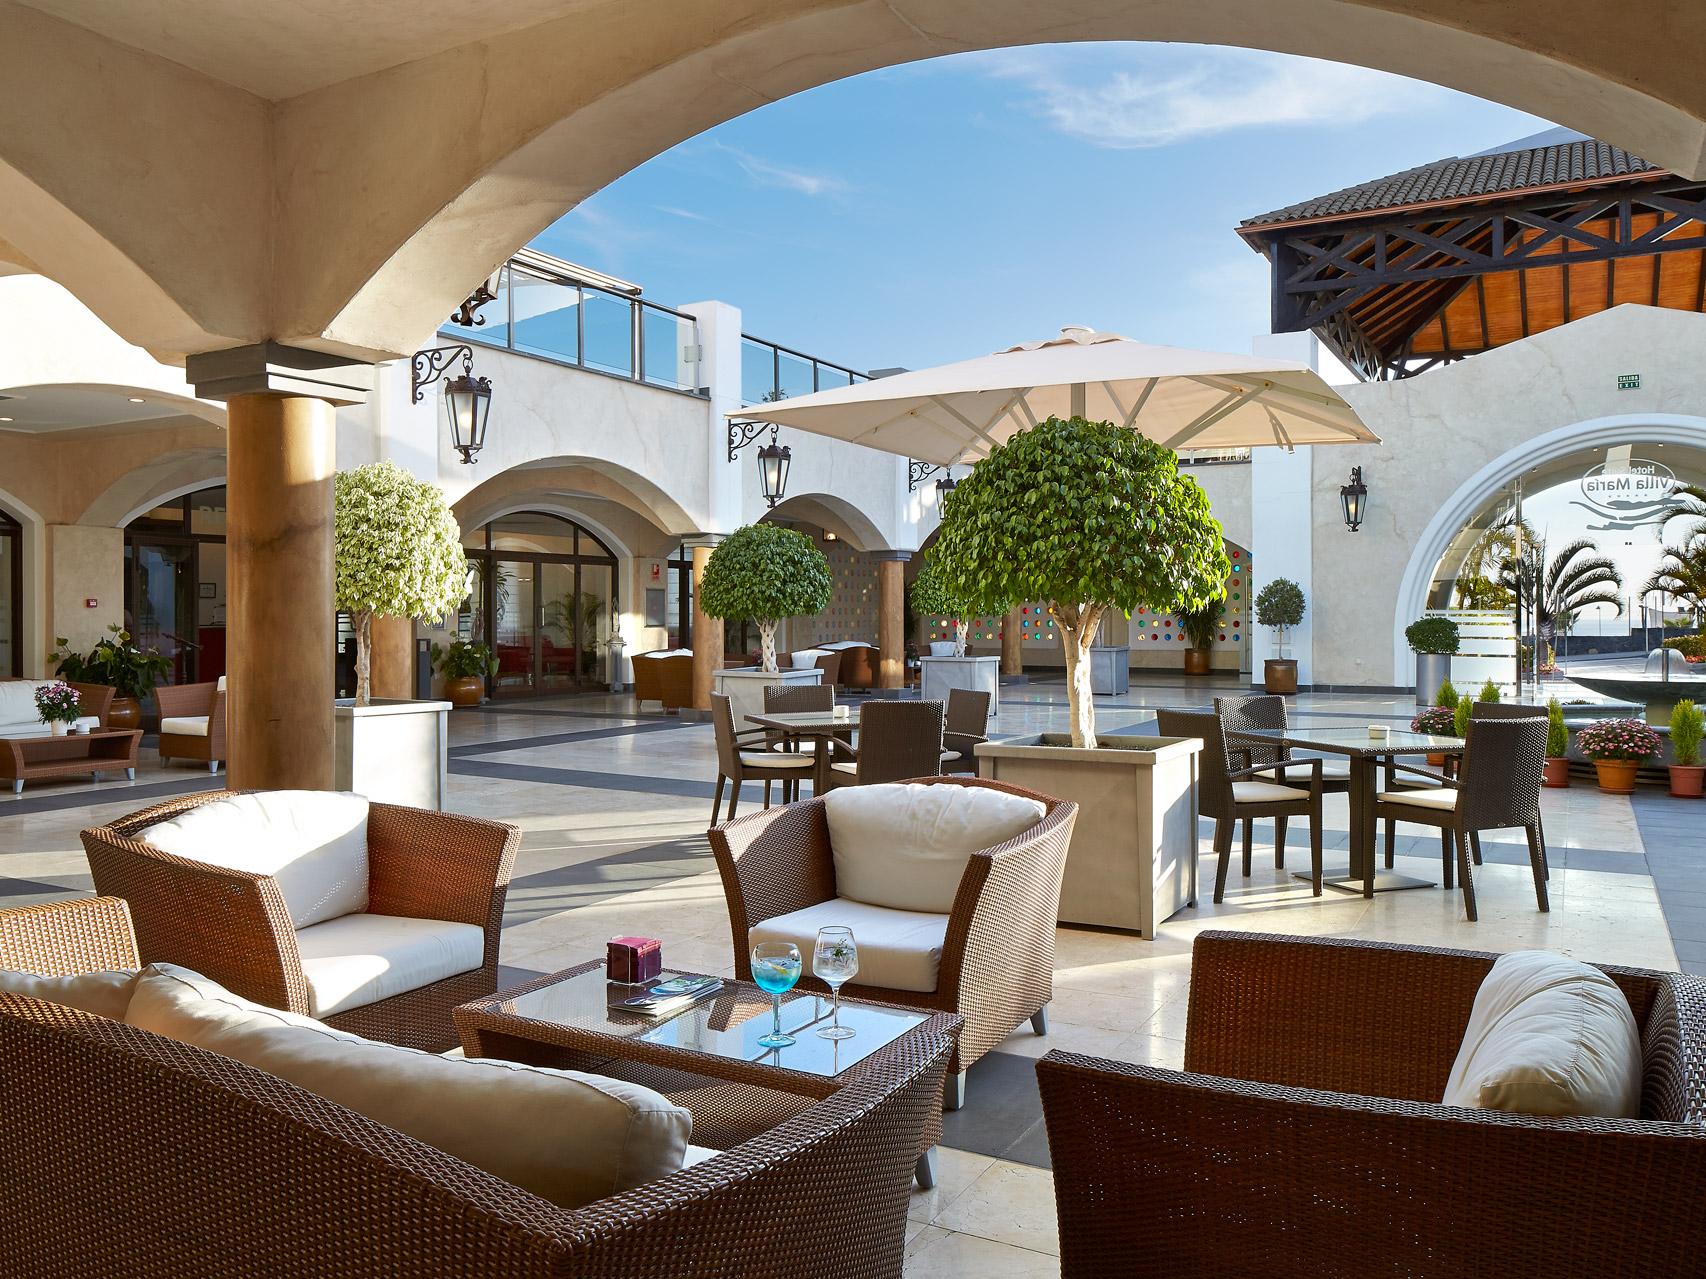 Villa Holidays Tenerife Canary Islands